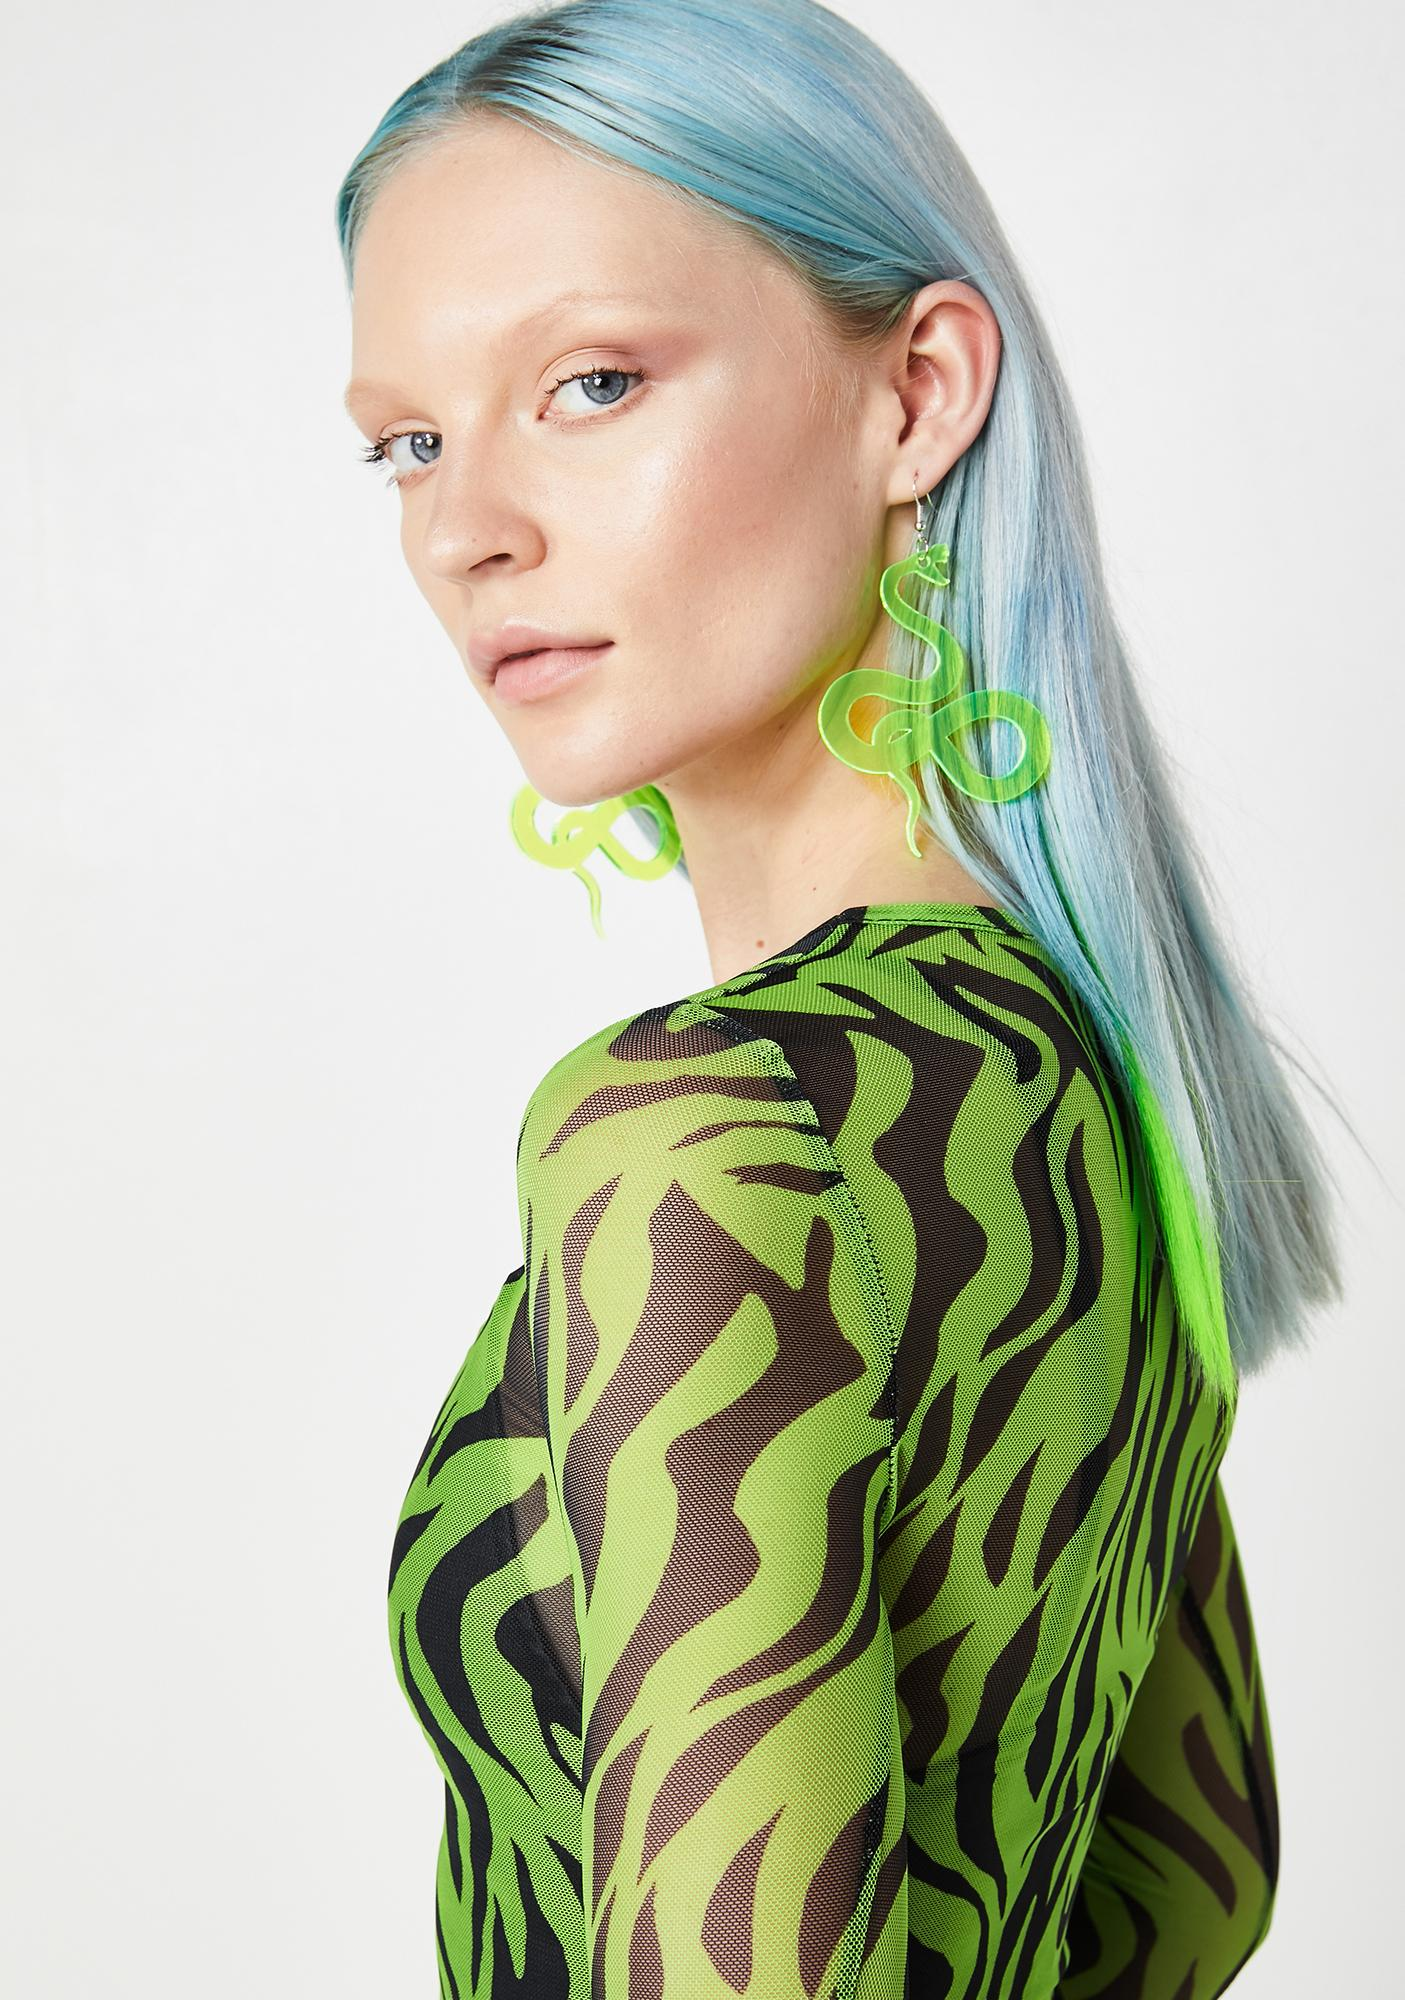 Ivy Berlin Slithering Snake Neon Earrings